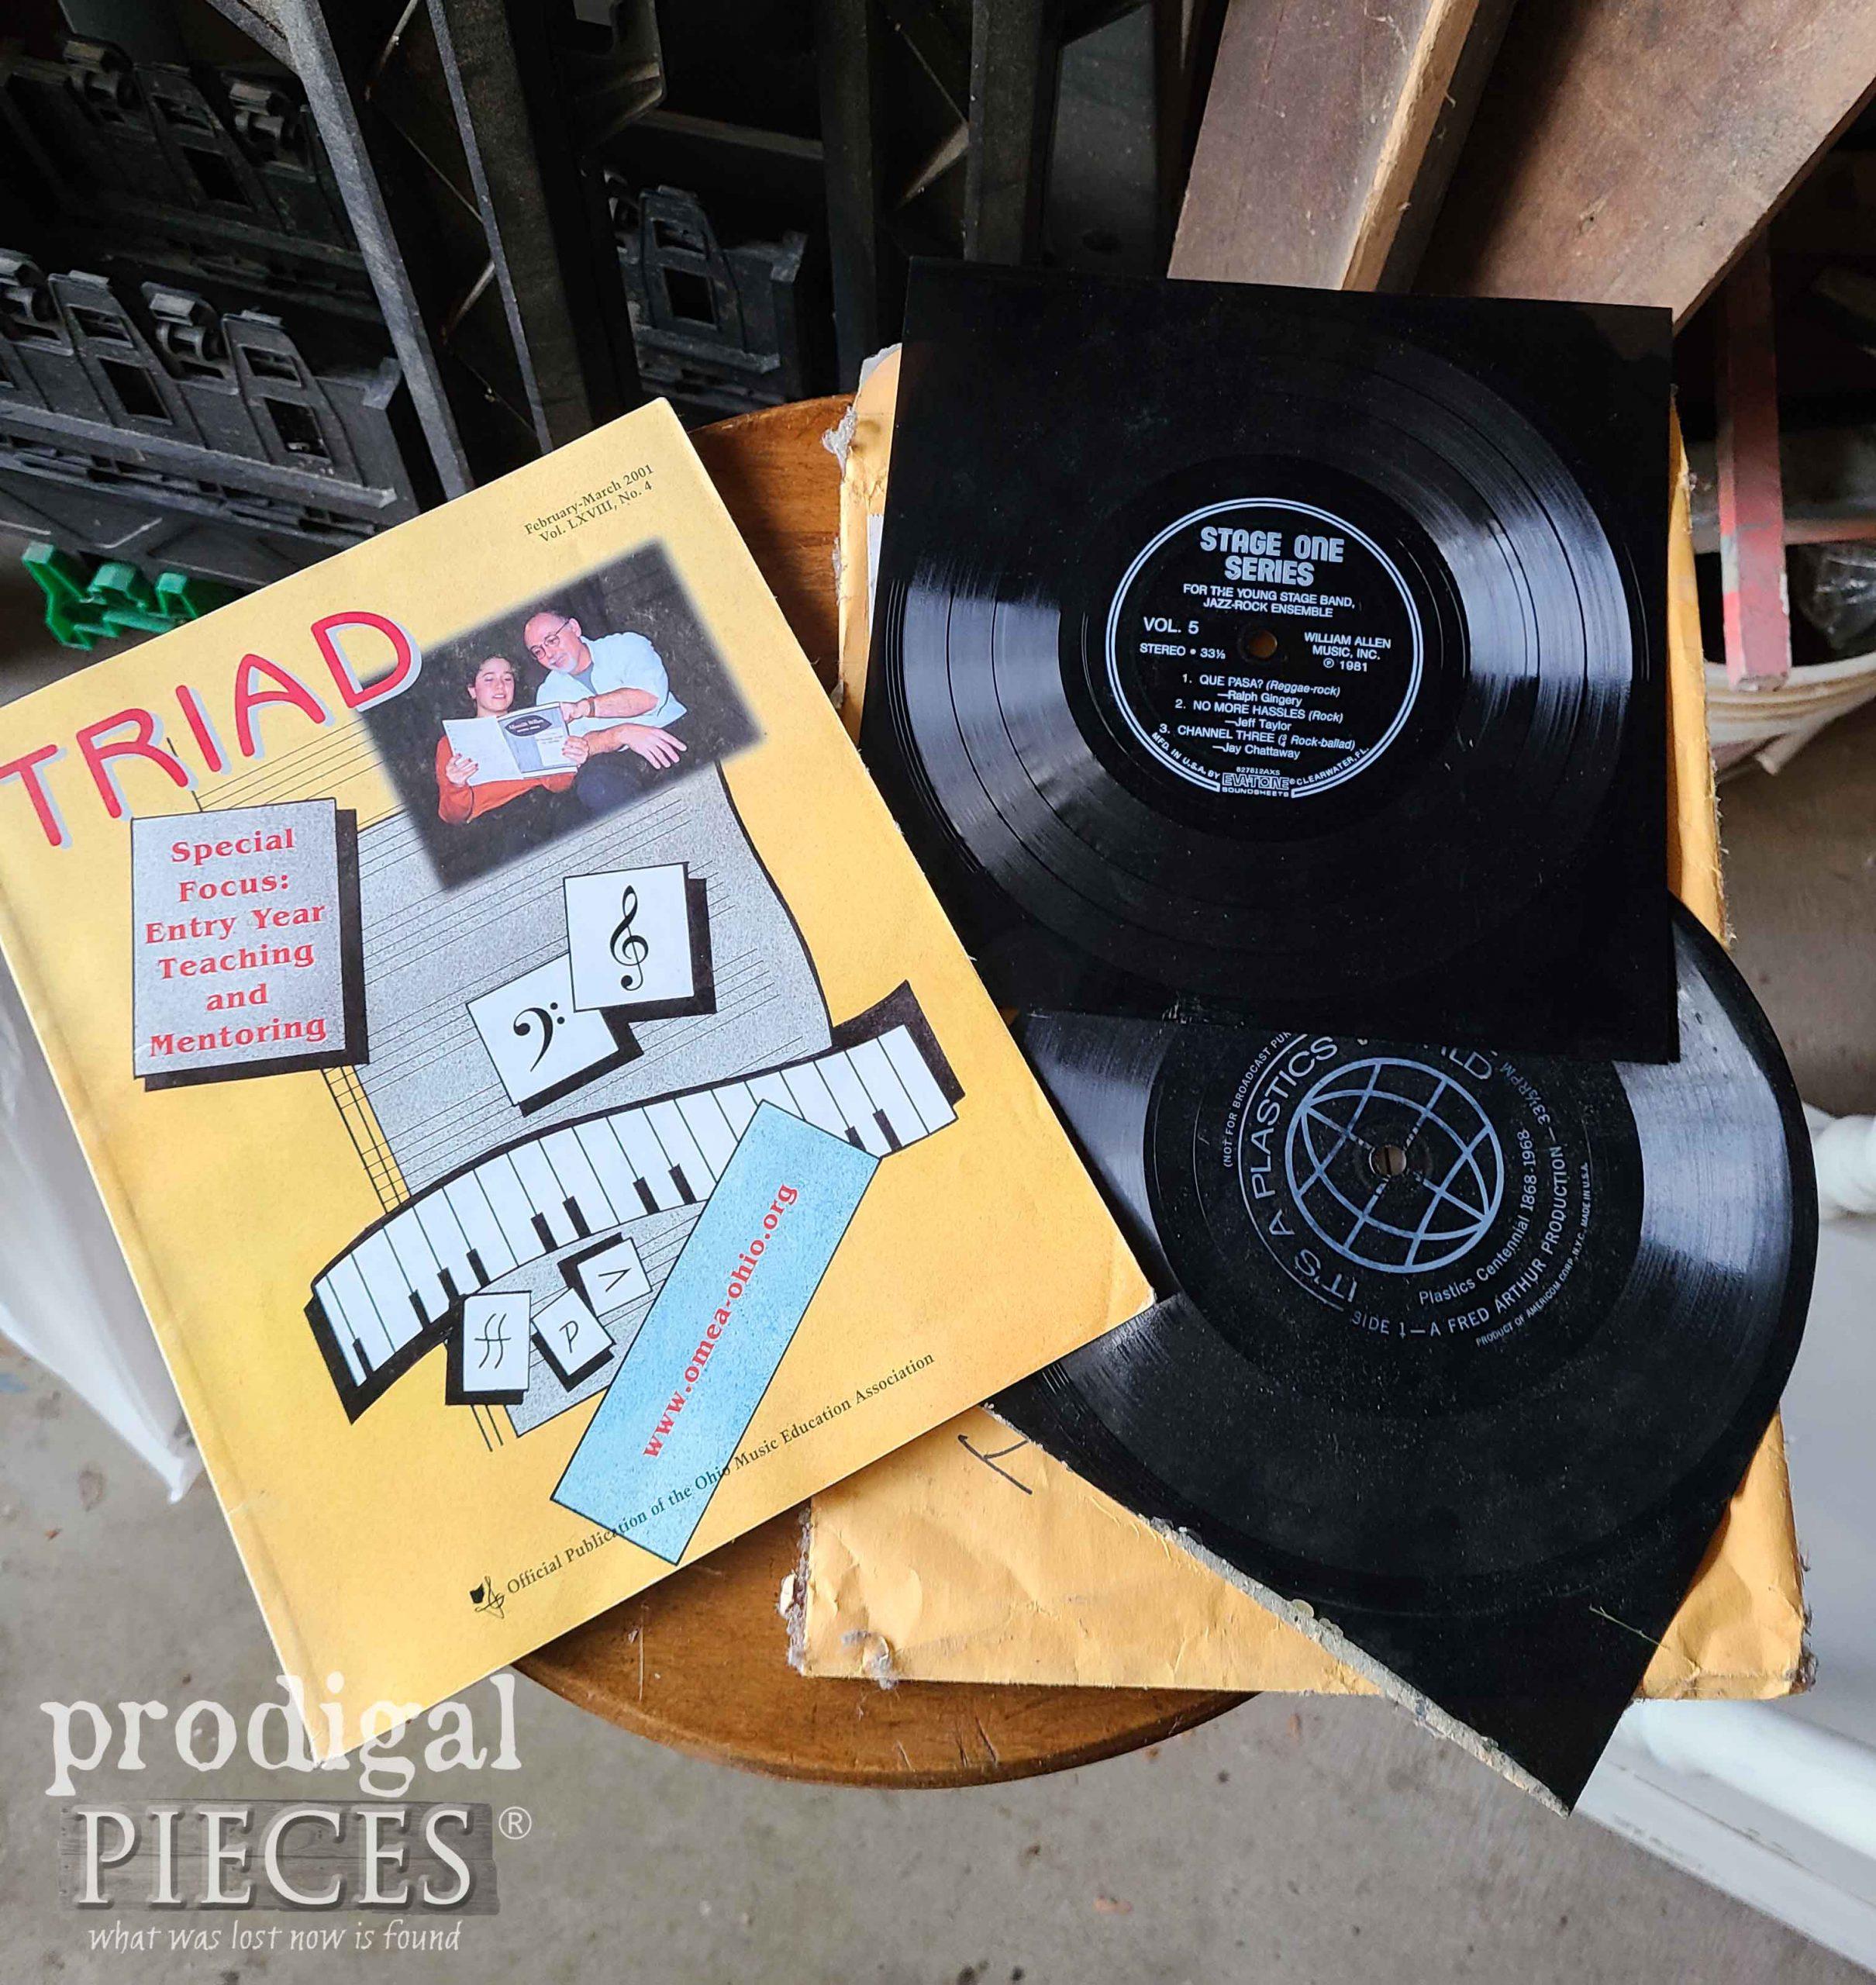 Found Music Teacher Supplies Inside Filing Cabinets   prodigalpieces.com